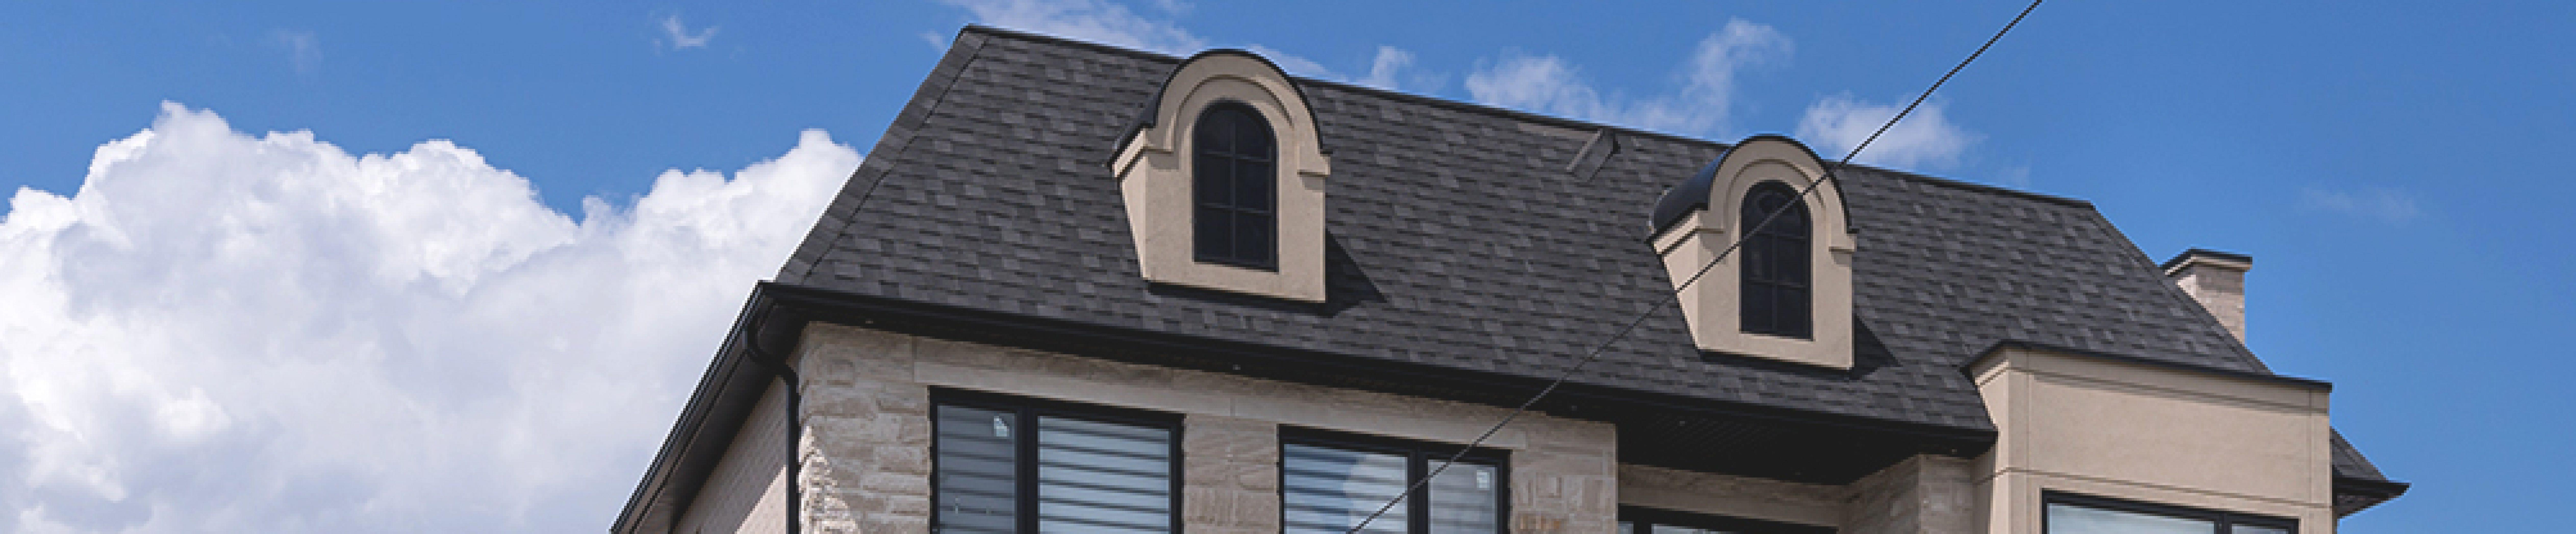 Exterior stucco home near Balkan Rd, Toronto Ontario Sky Stucco Systems